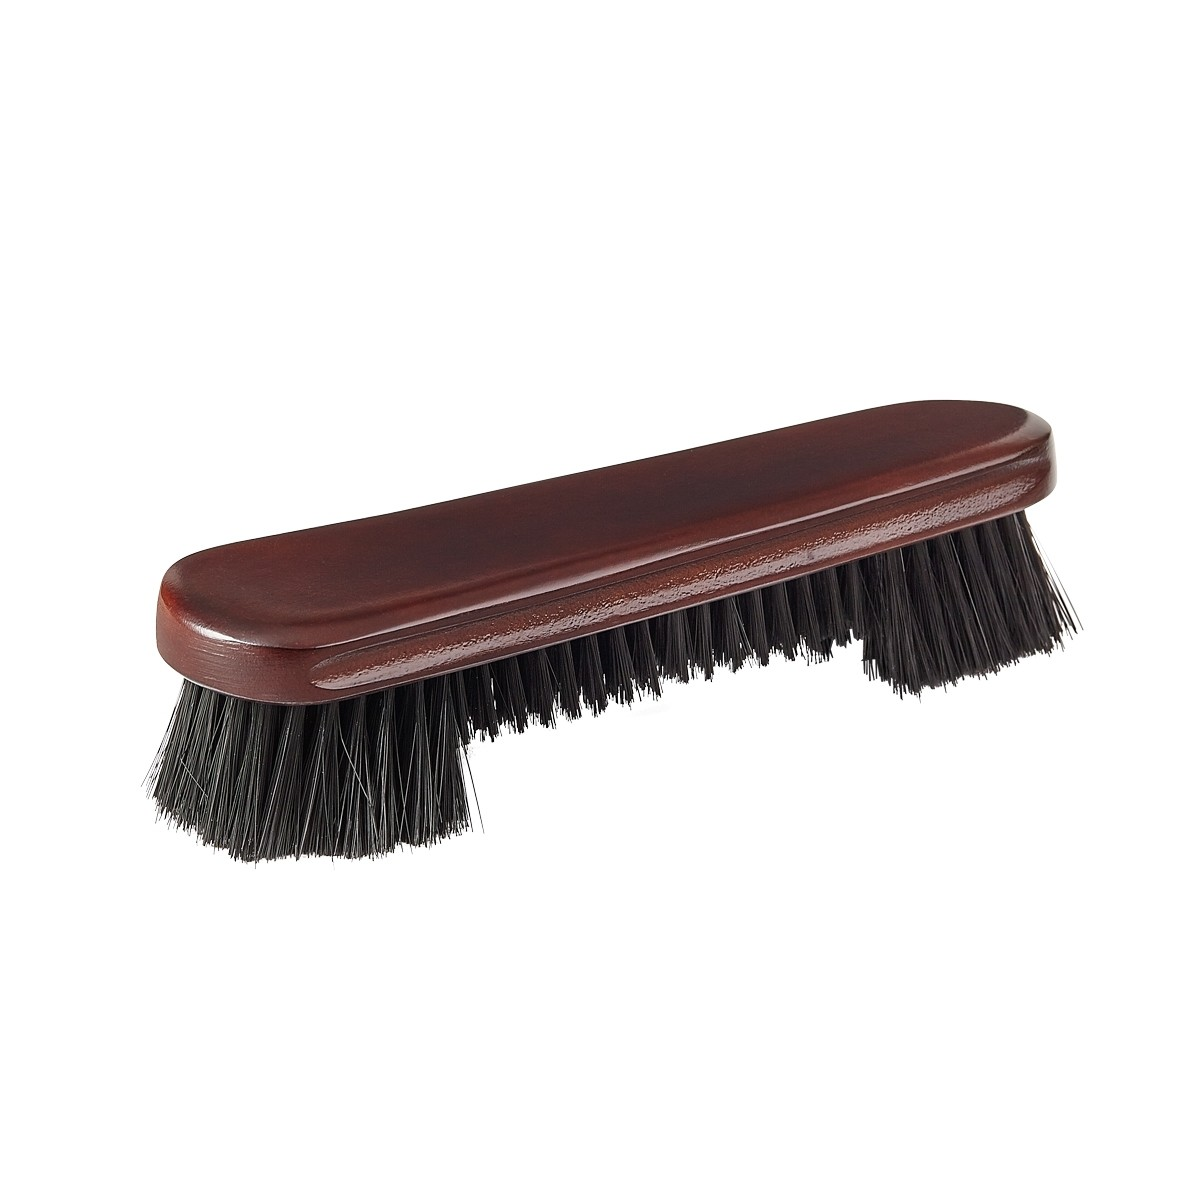 59015 Table Brush PowerGlide